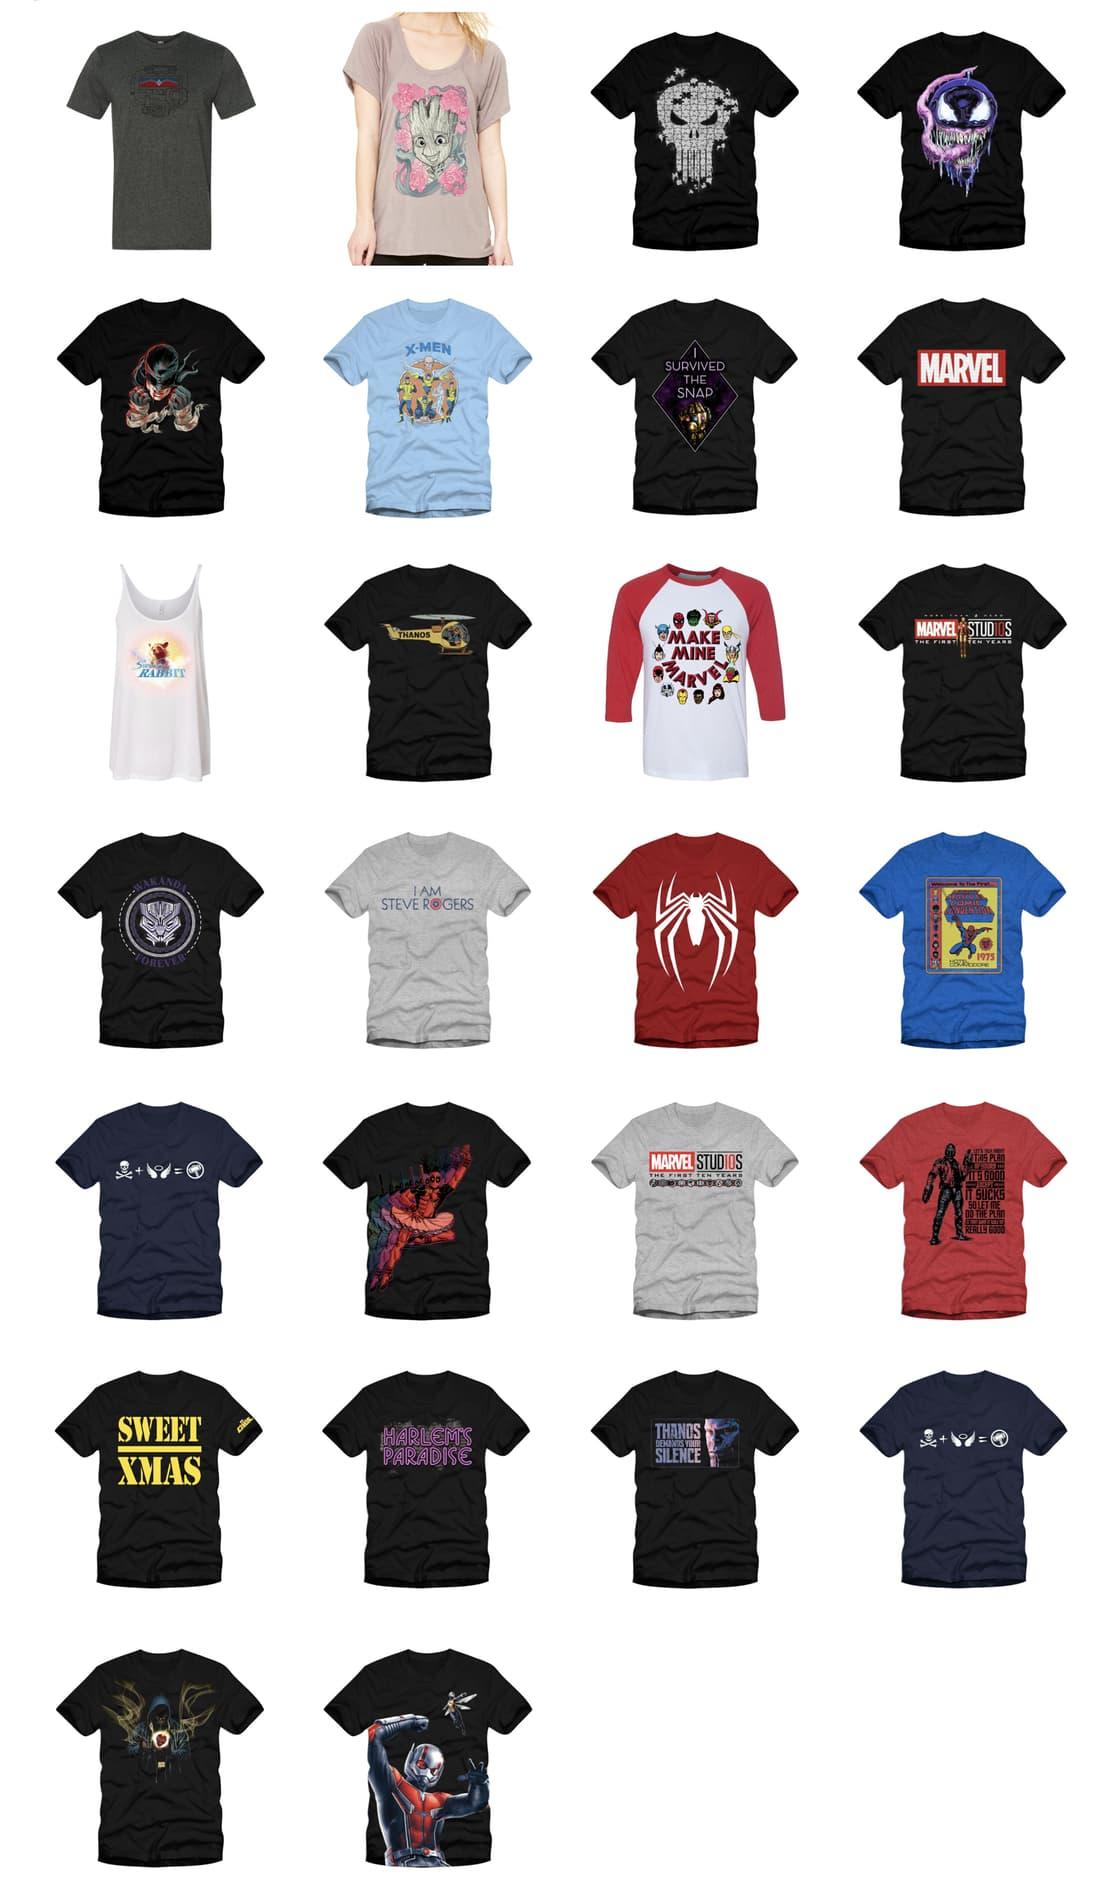 NYCC Shirts